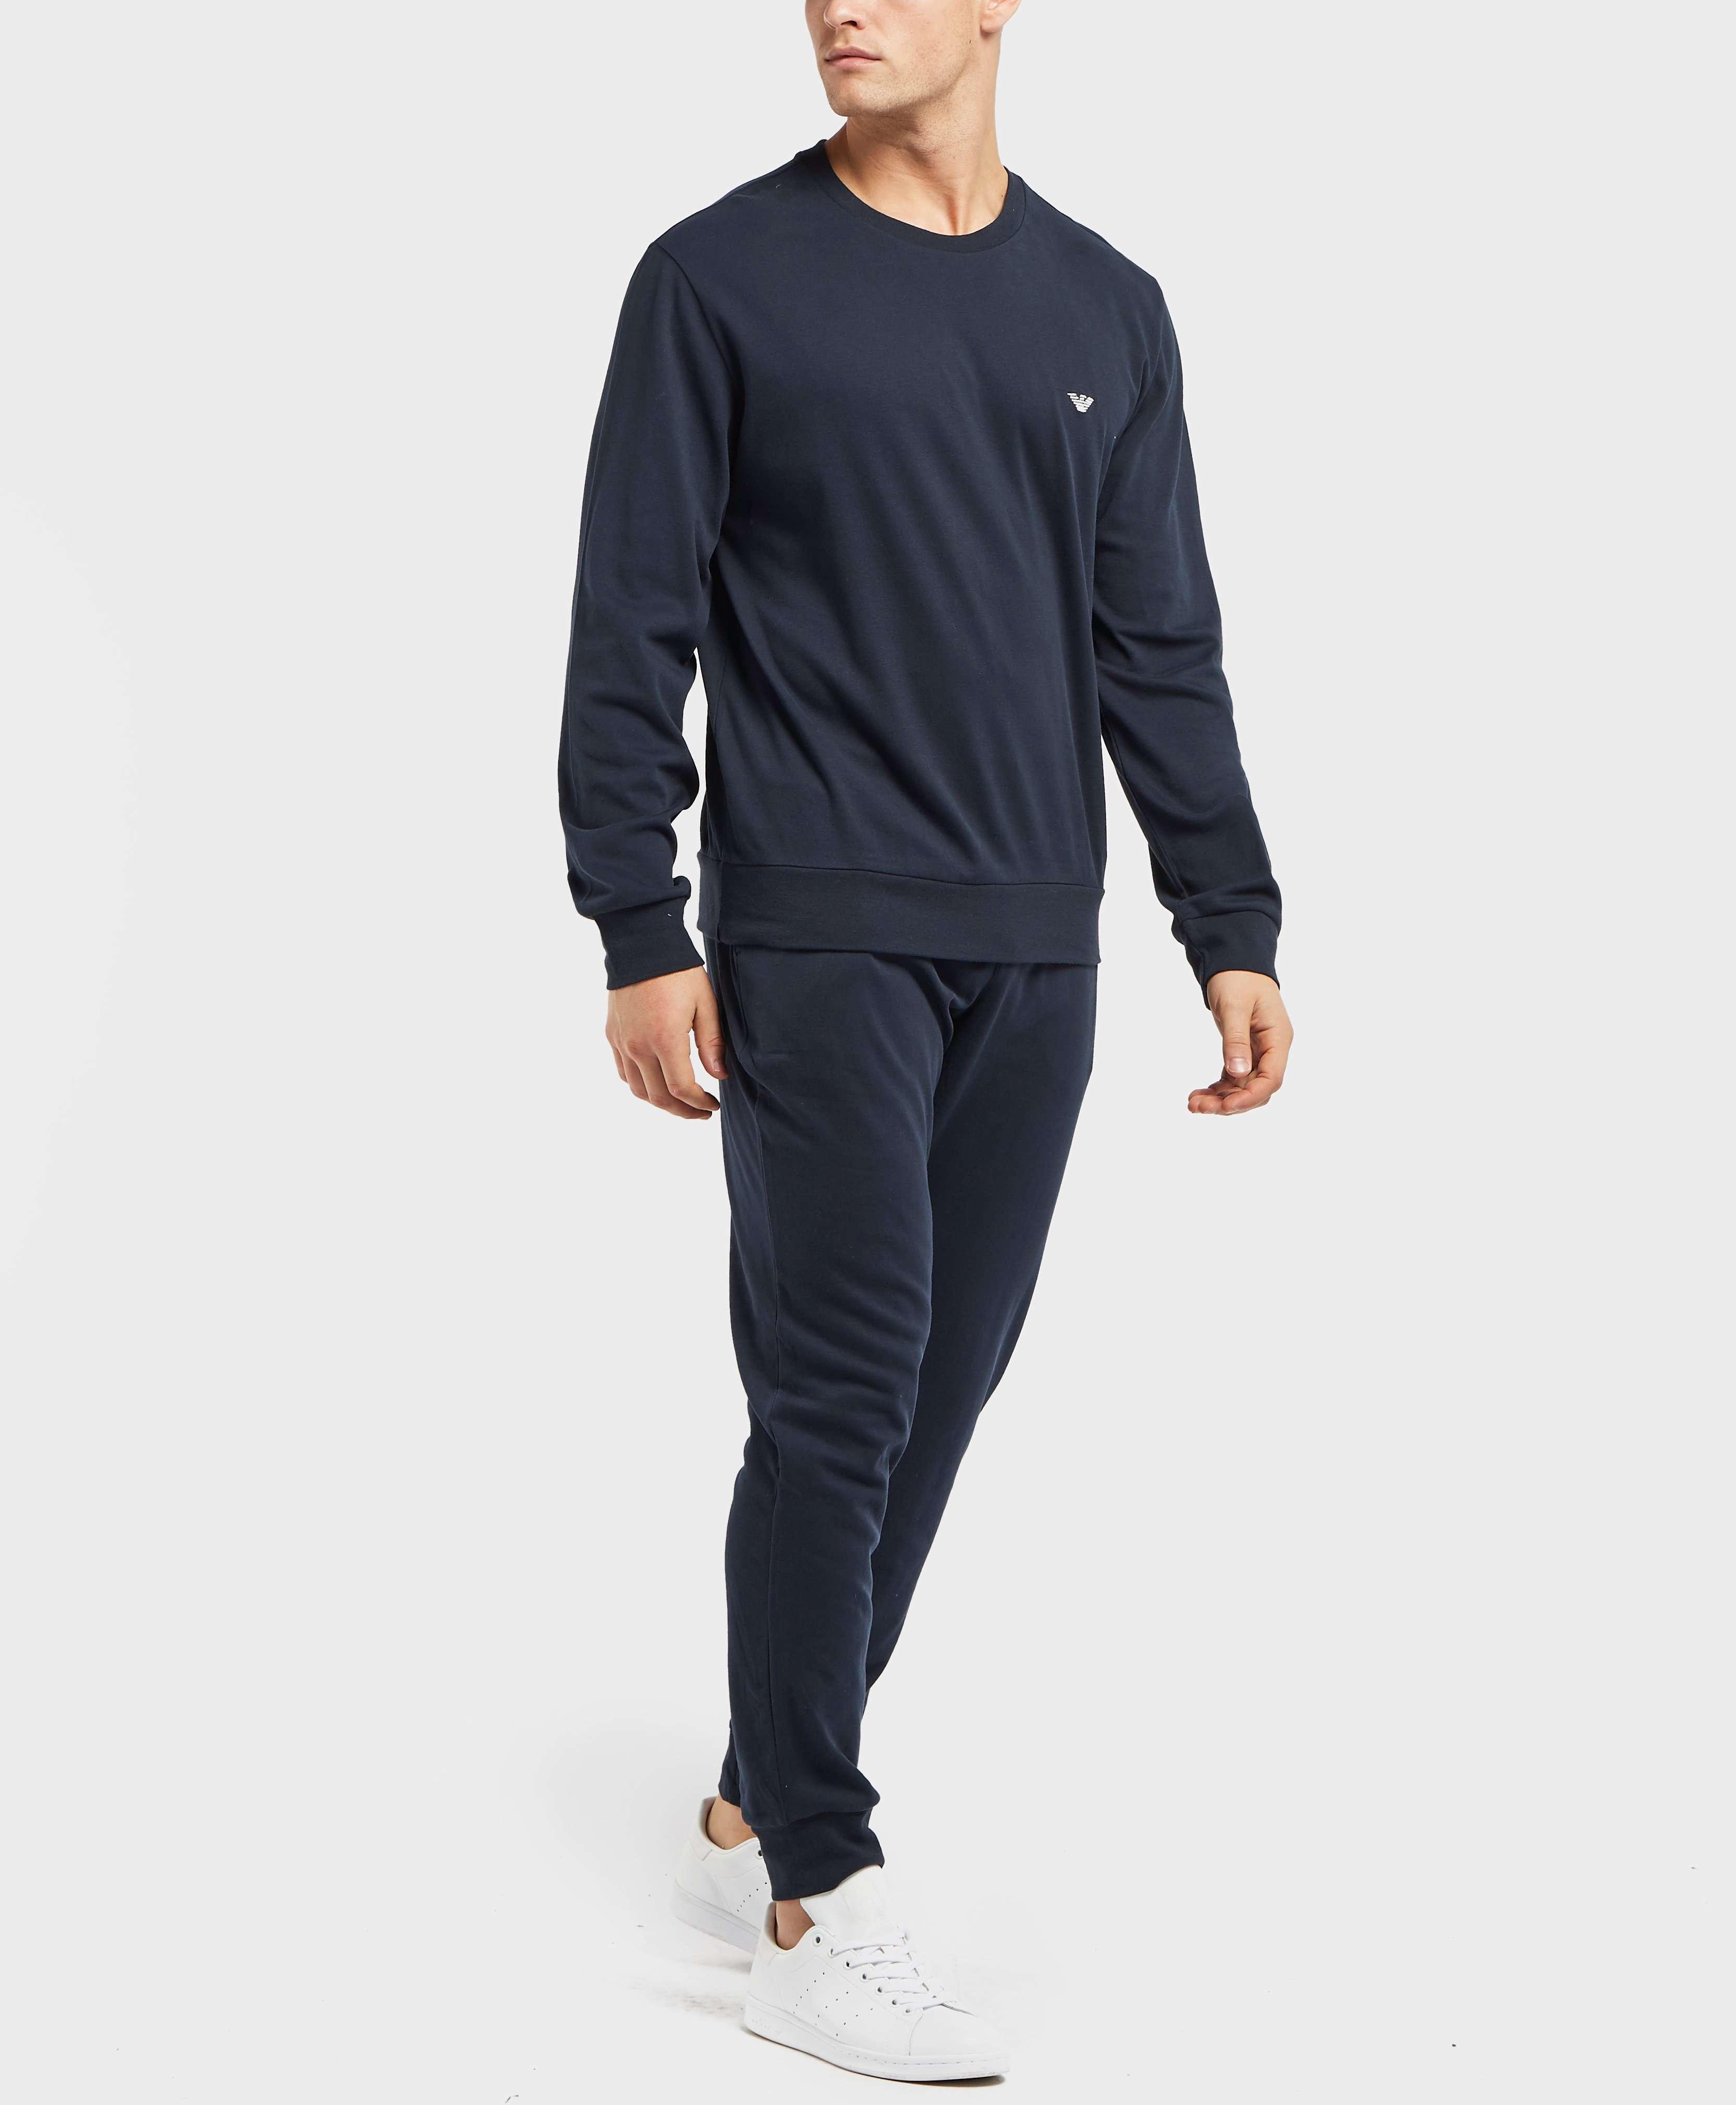 Emporio Armani Small Icon Crew Sweatshirt